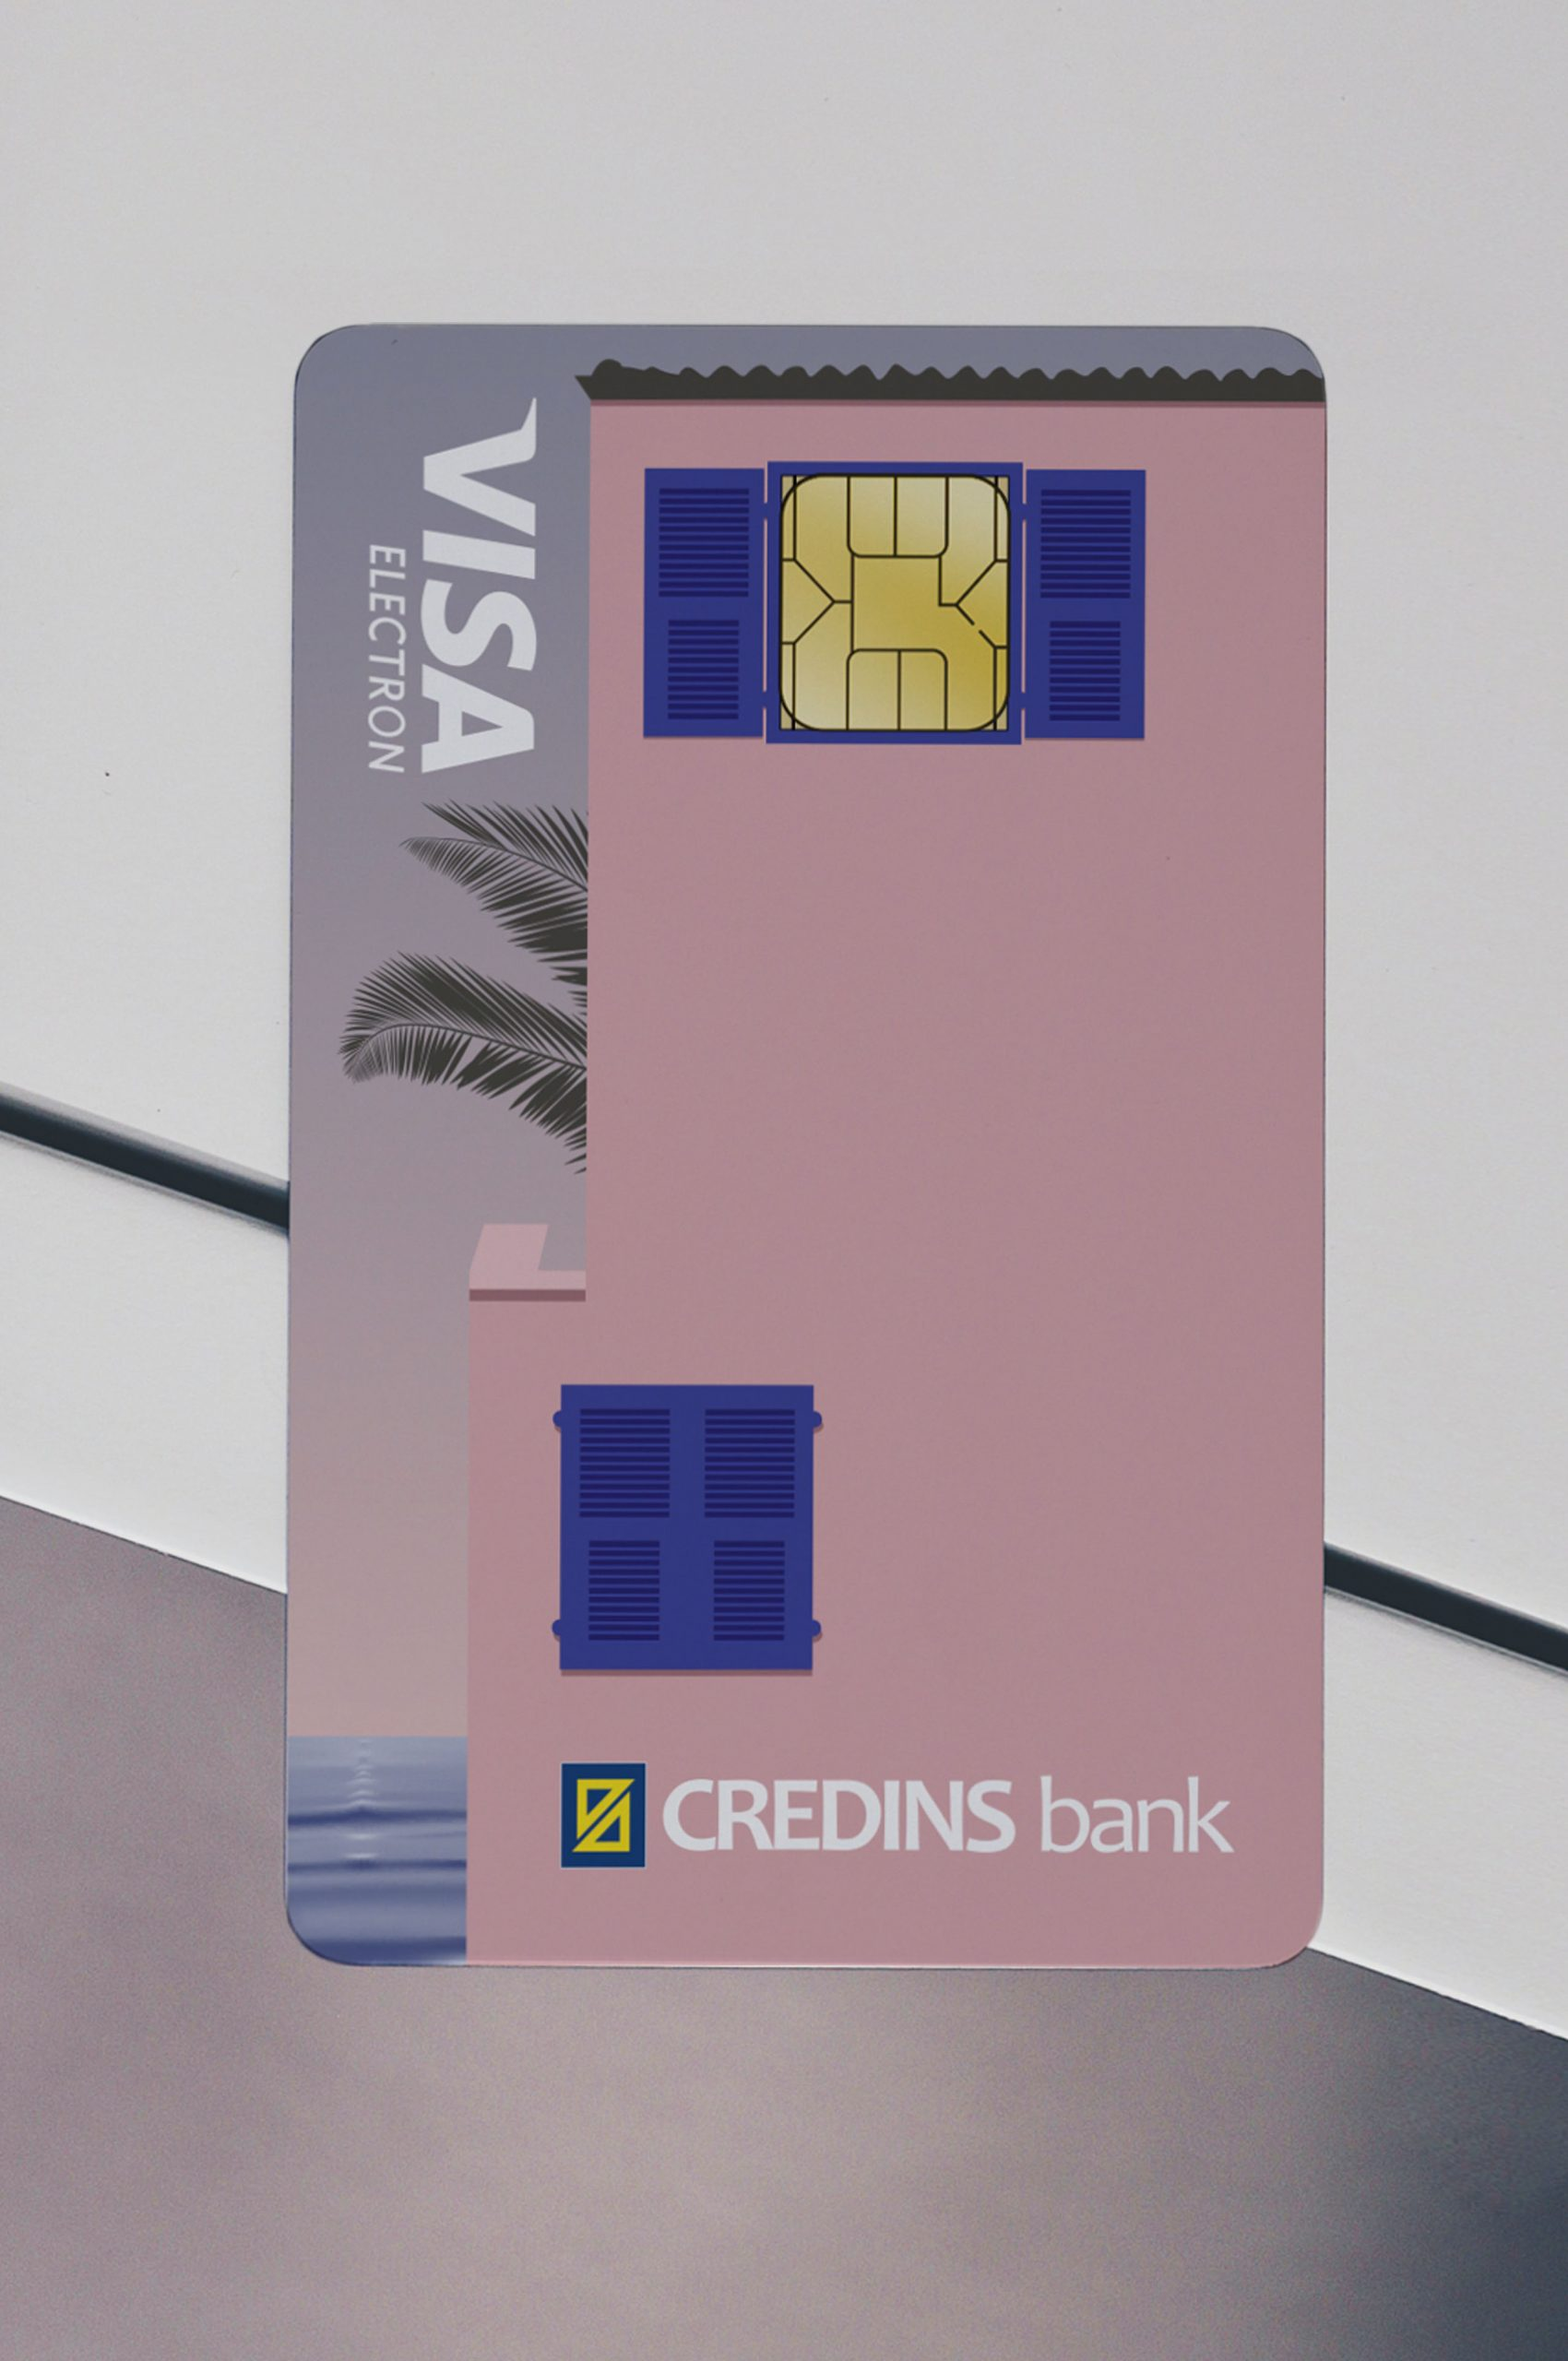 Credins Bank, Social, Project Img 2 - Vatra Agency / Founder & CEO Gerton Bejo